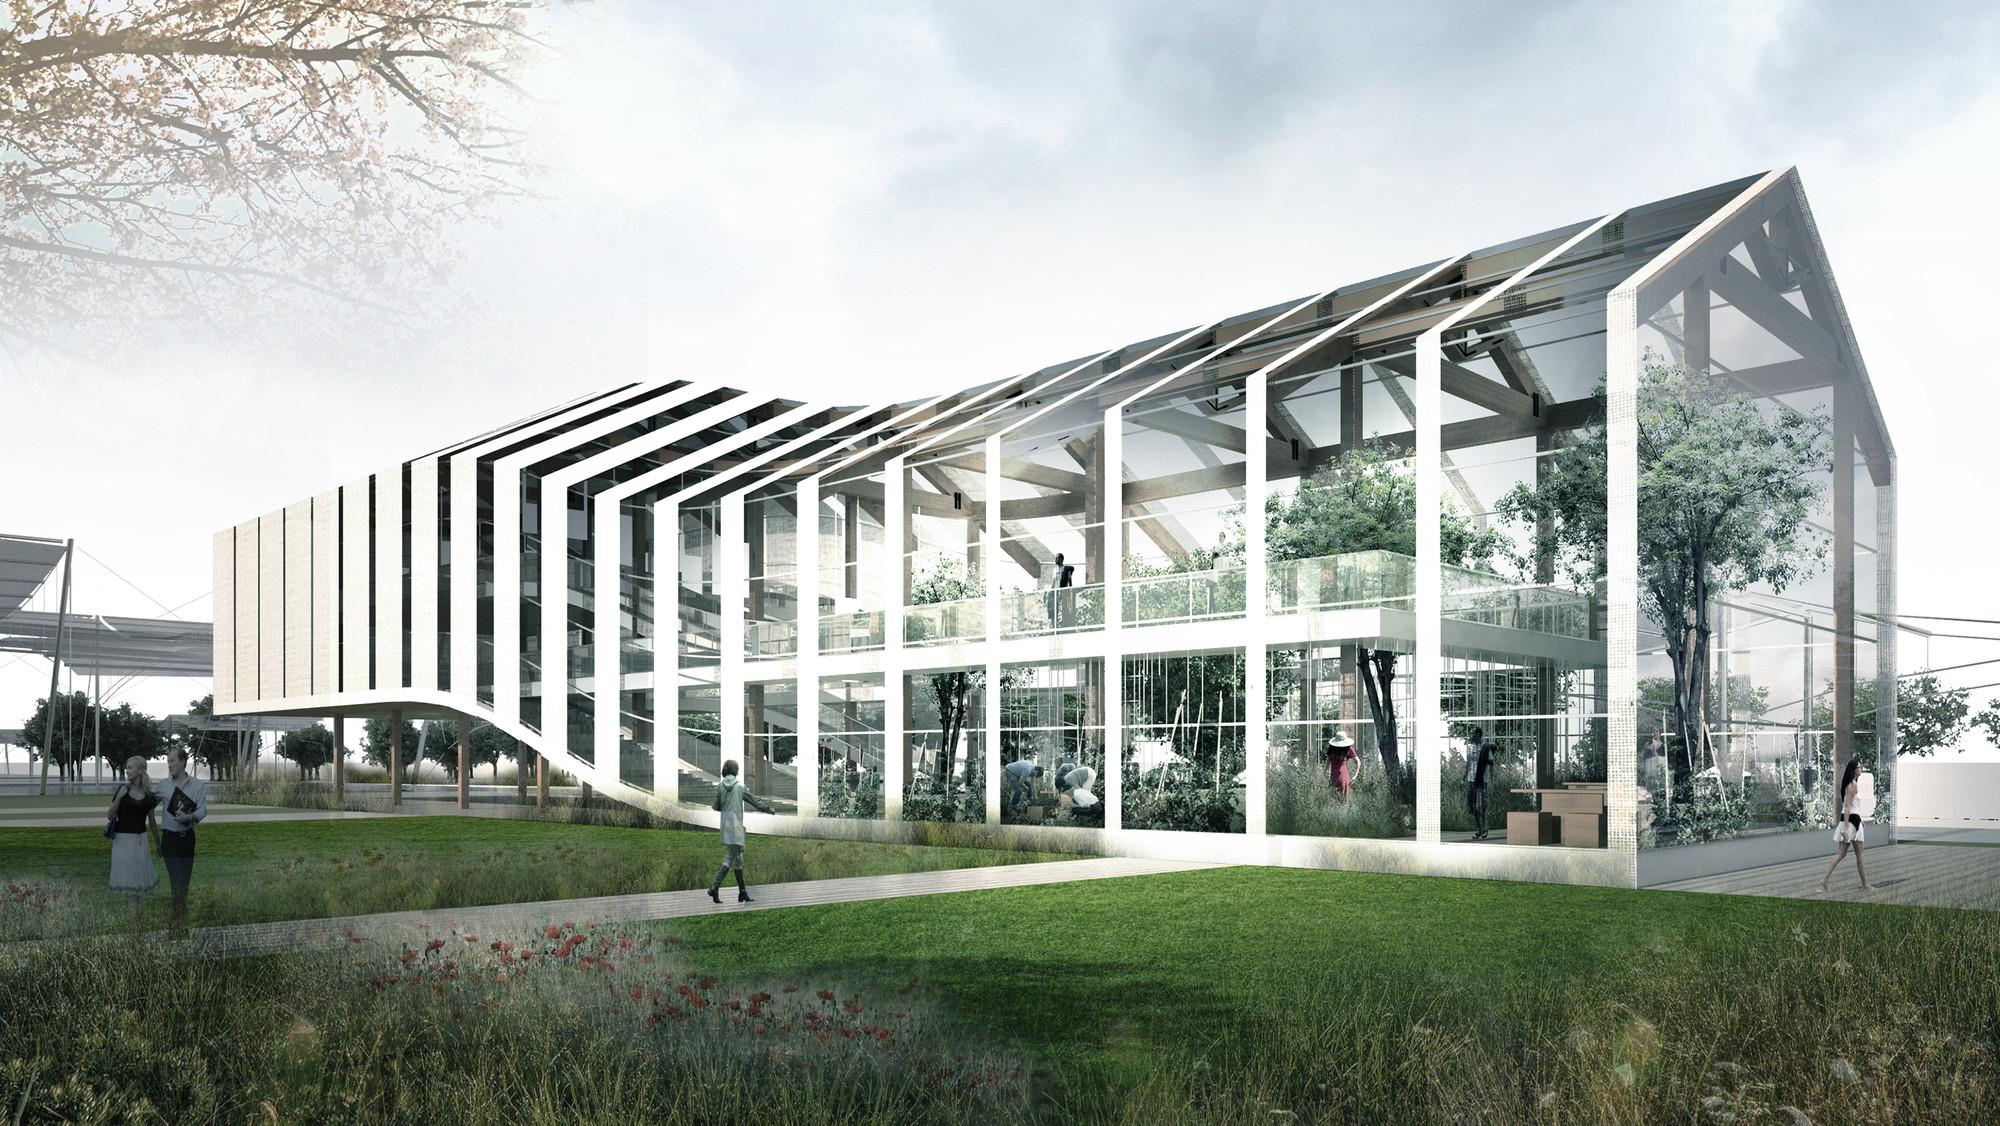 Competition Entry: Austrian Pavilion (Milan Expo 2015) / Paolo Venturella, © wemage, Courtesy of Paolo Venturella